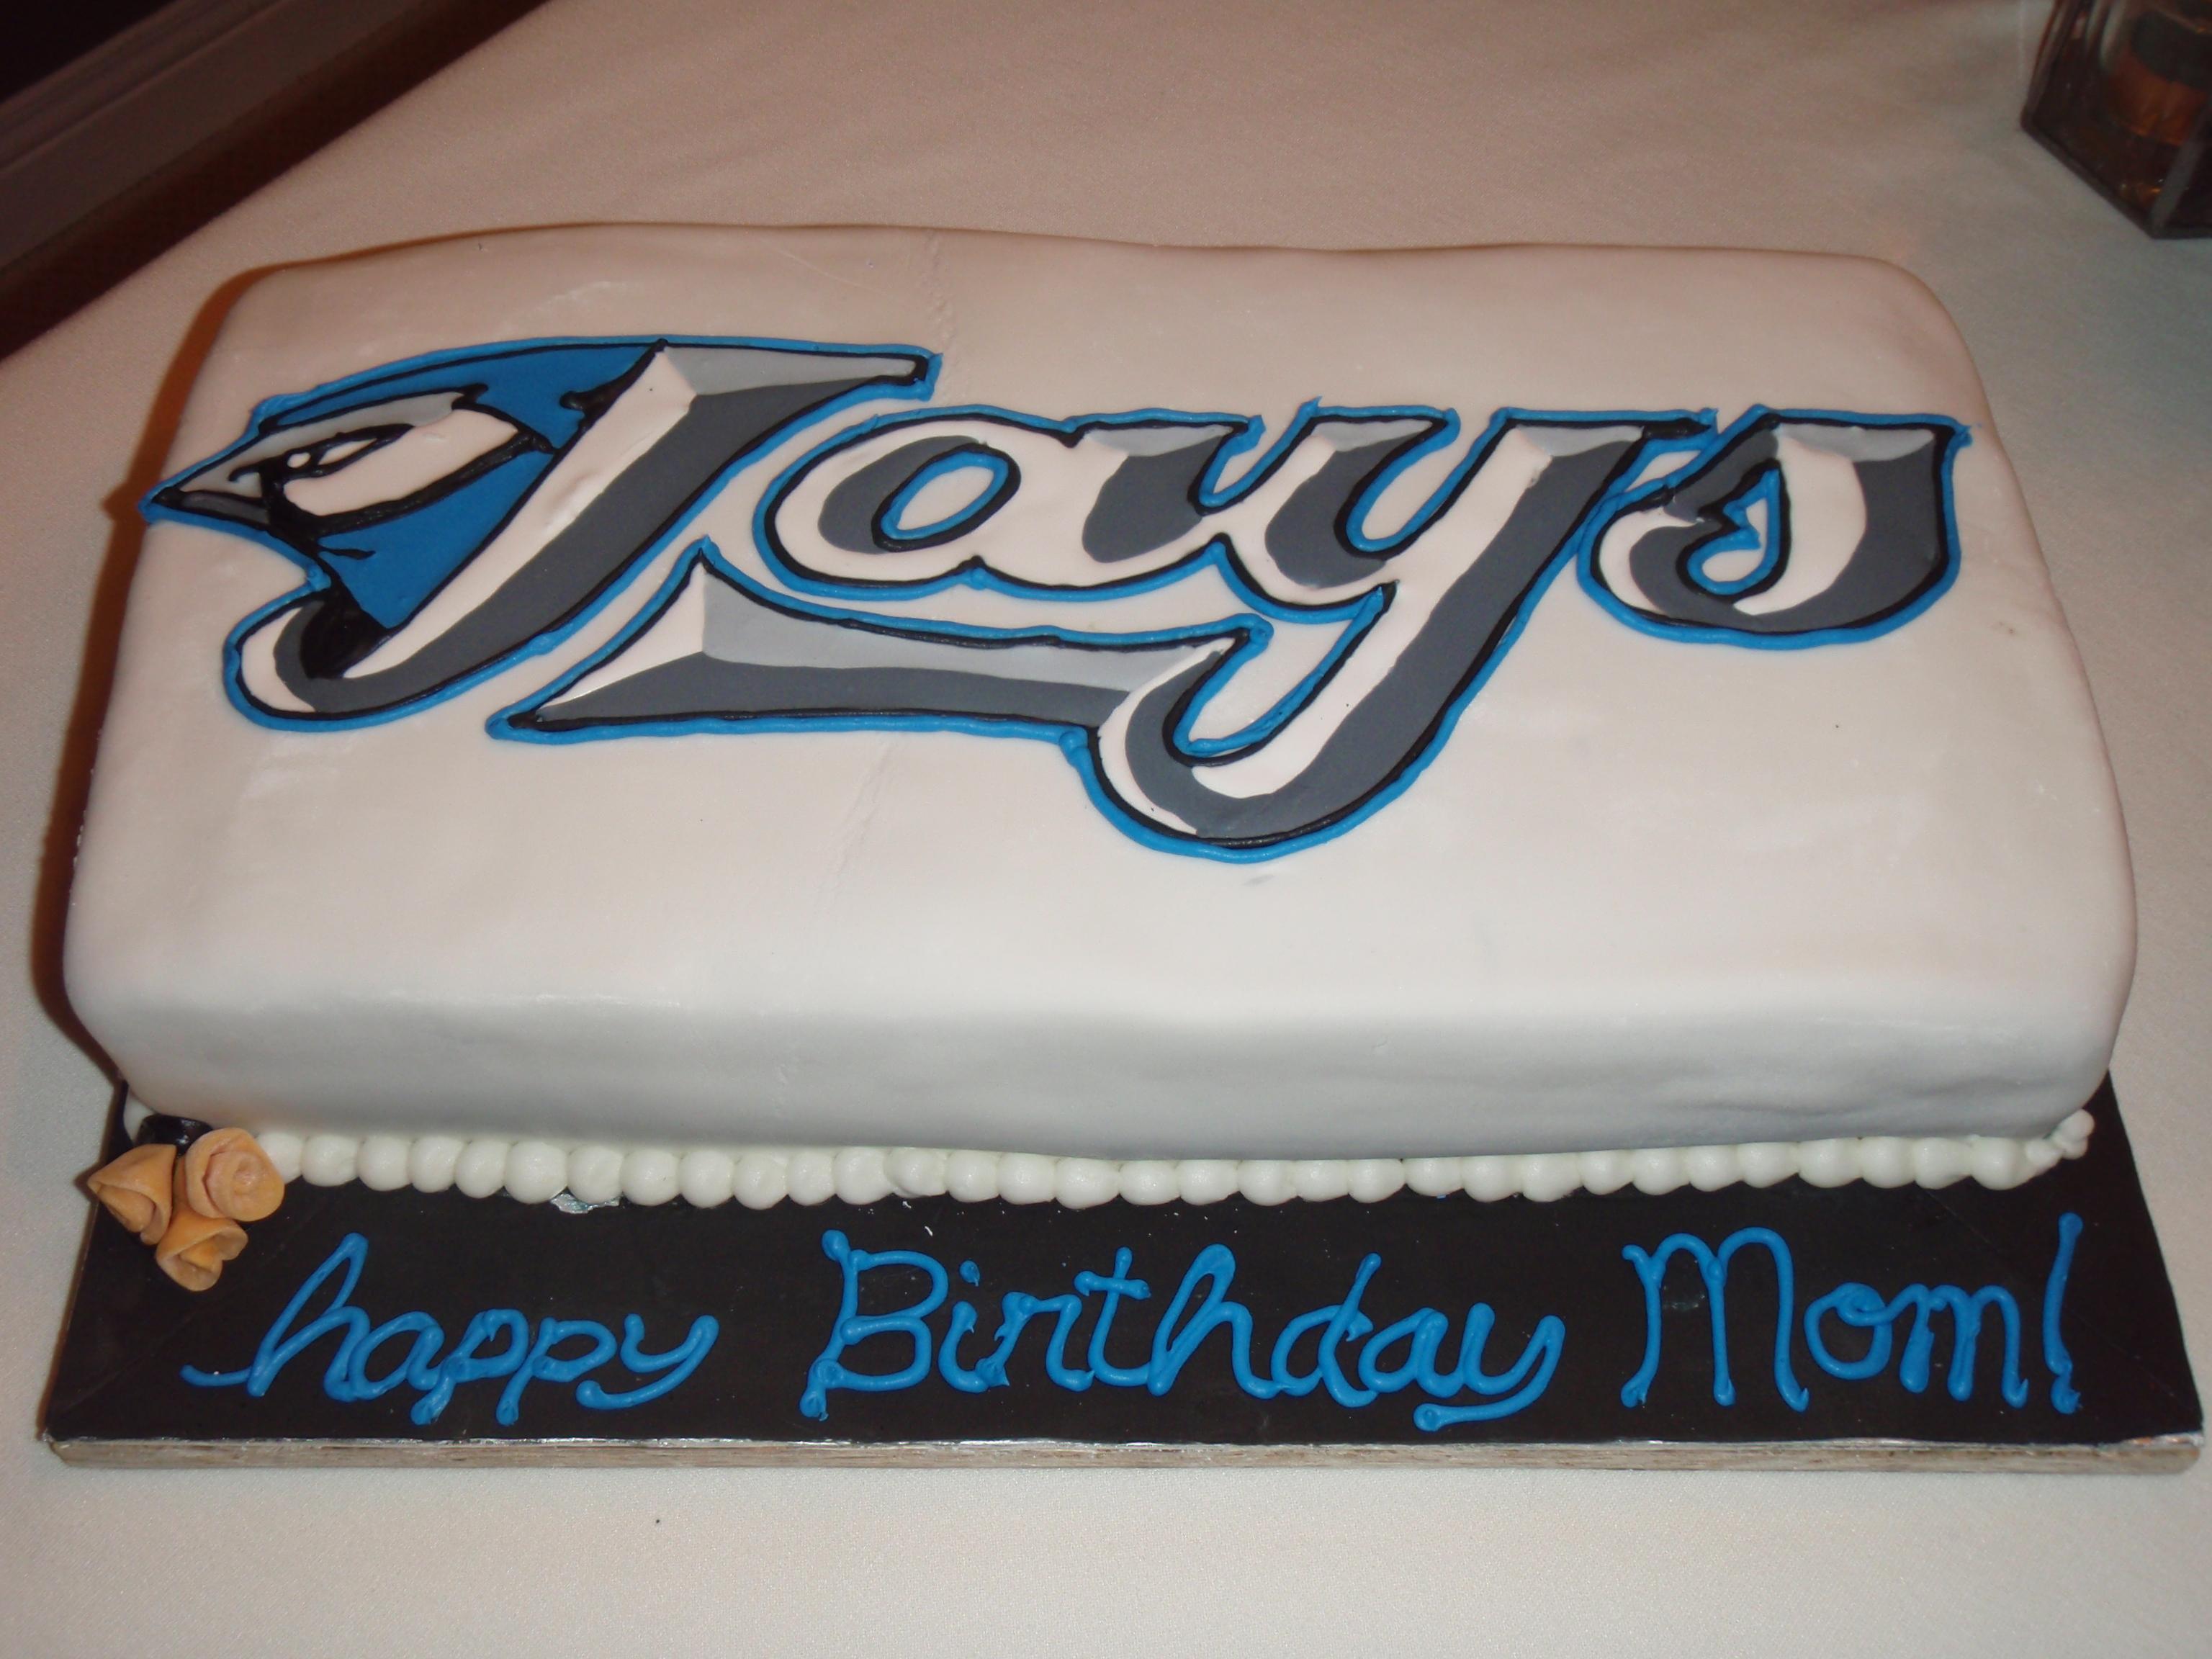 Blue Jays Emmy J Cake Design